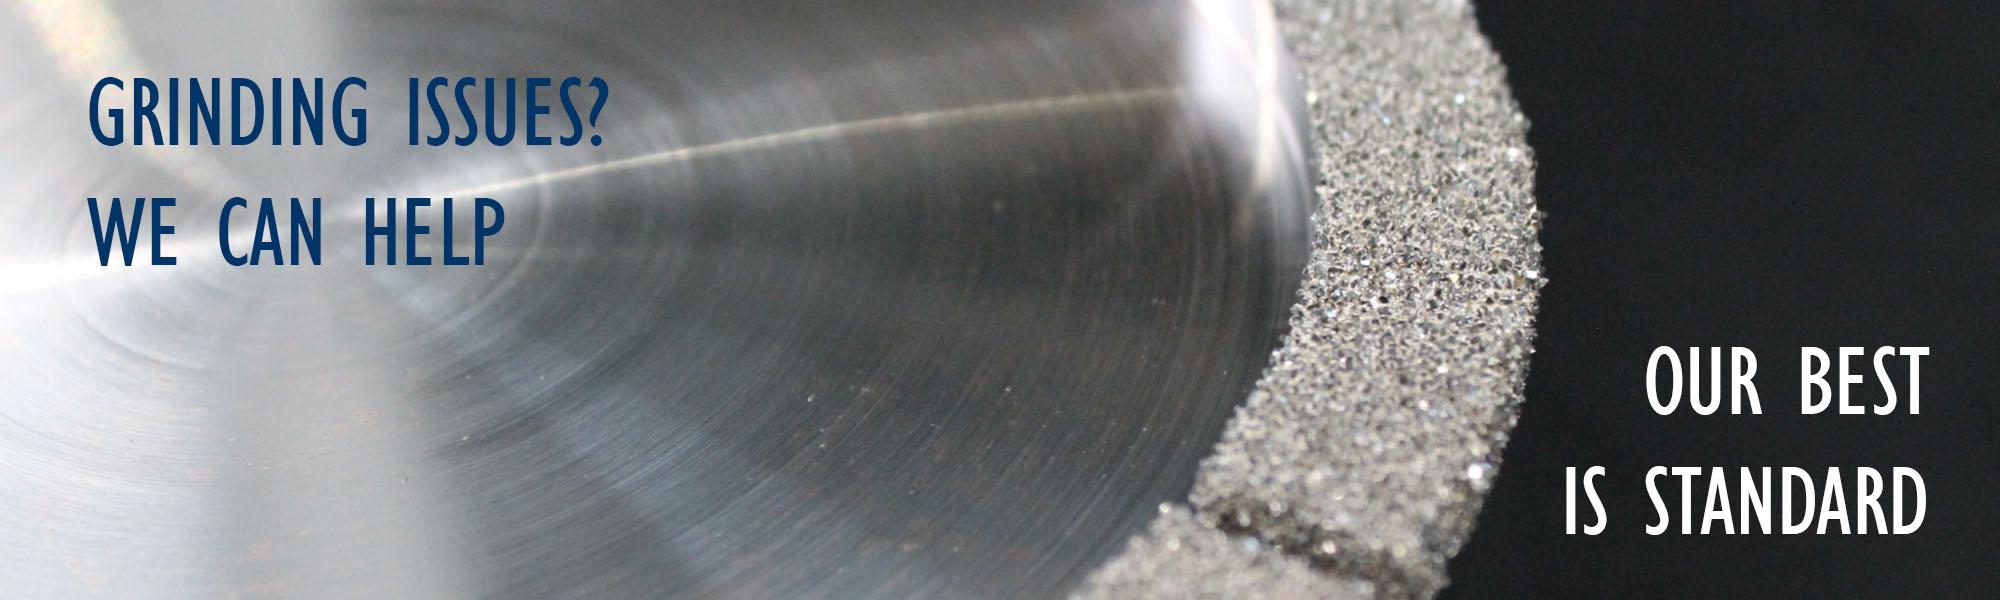 S.L. Munson & Company - Grinding Wheels & Diamond Dressing Tools